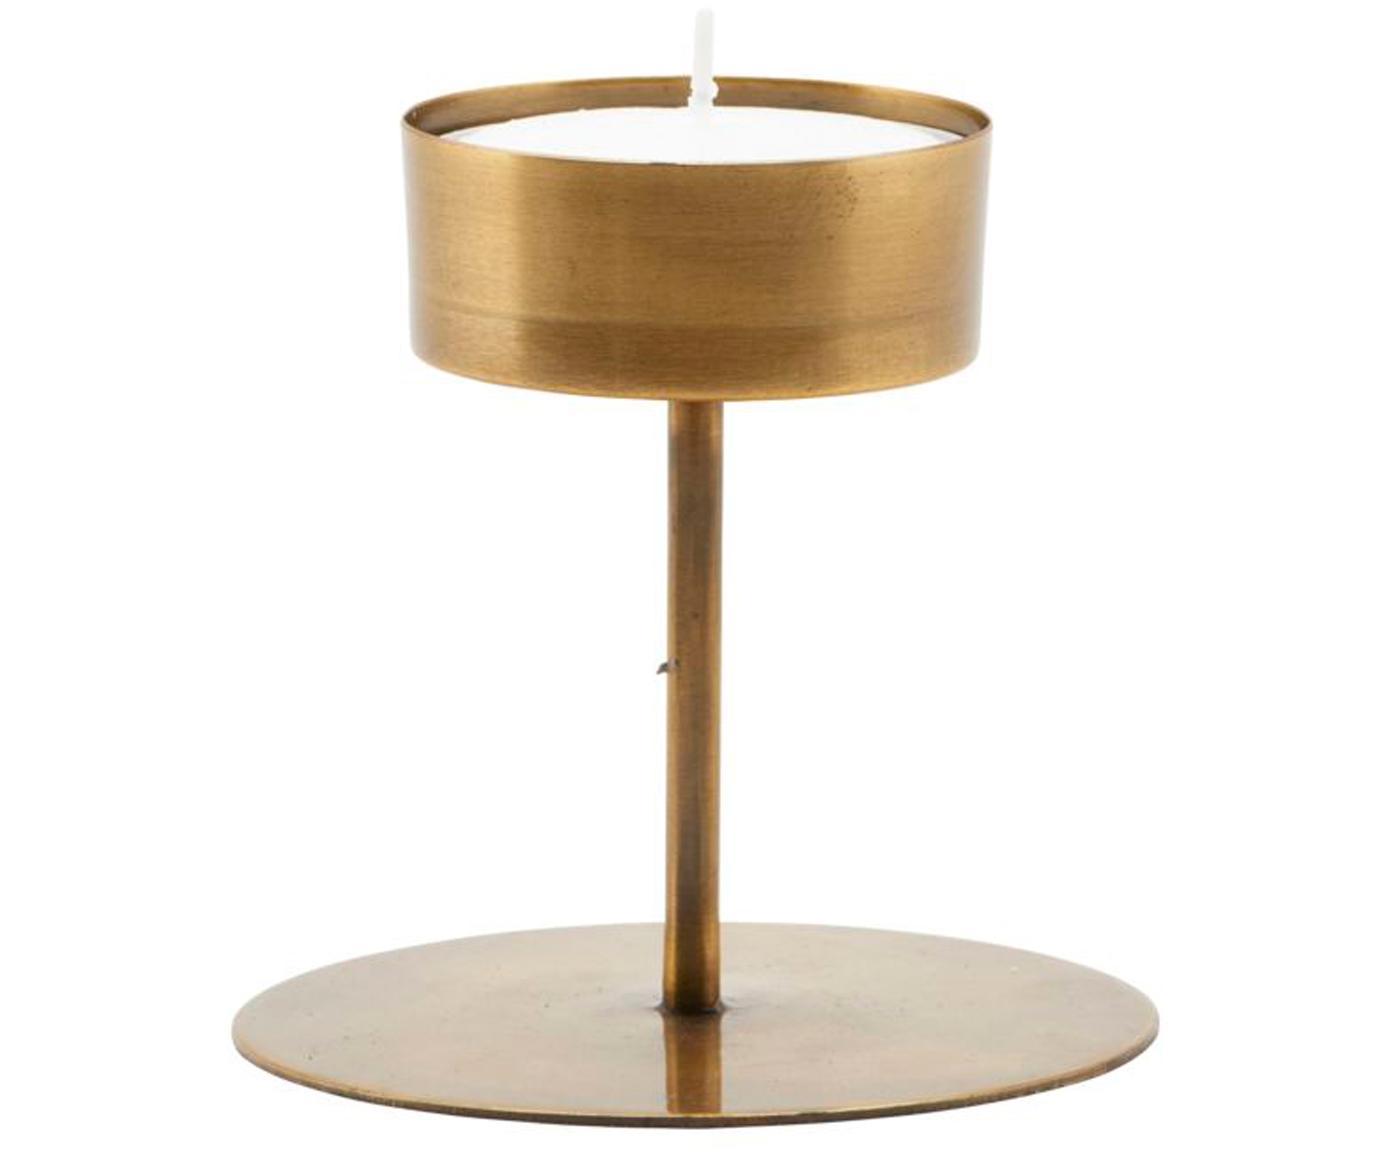 Teelichthalter Anit, Metall, beschichtet, Messingfarben, Ø 11 x H 10 cm